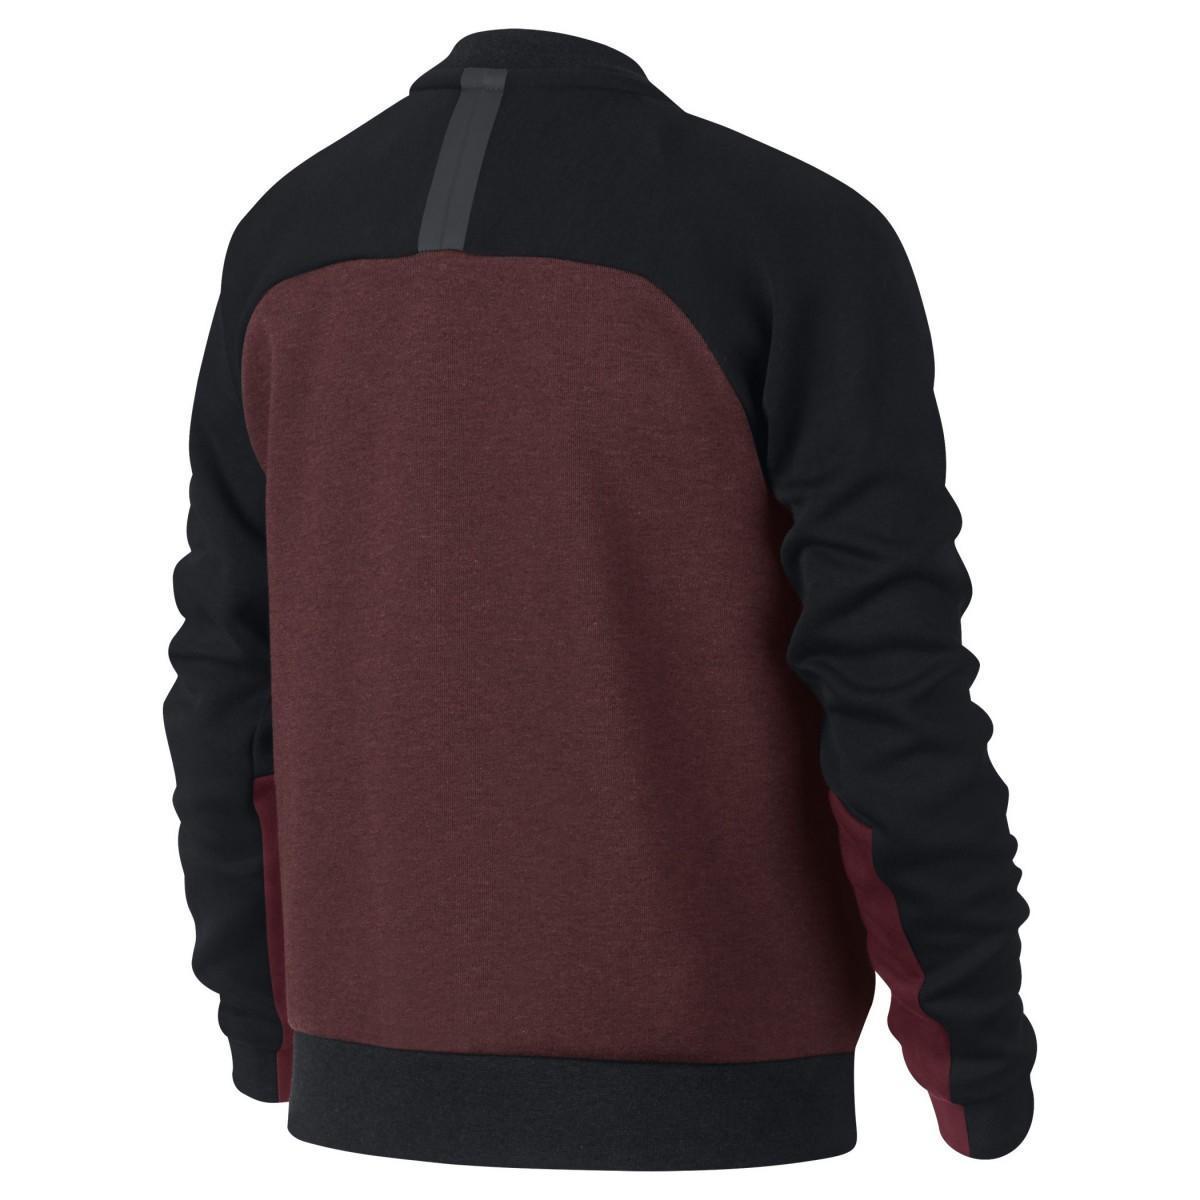 Куртка детская Nike Sportswear Tech Fleece Bomber Dark Team Red/Heather/Team Red/Anthracite